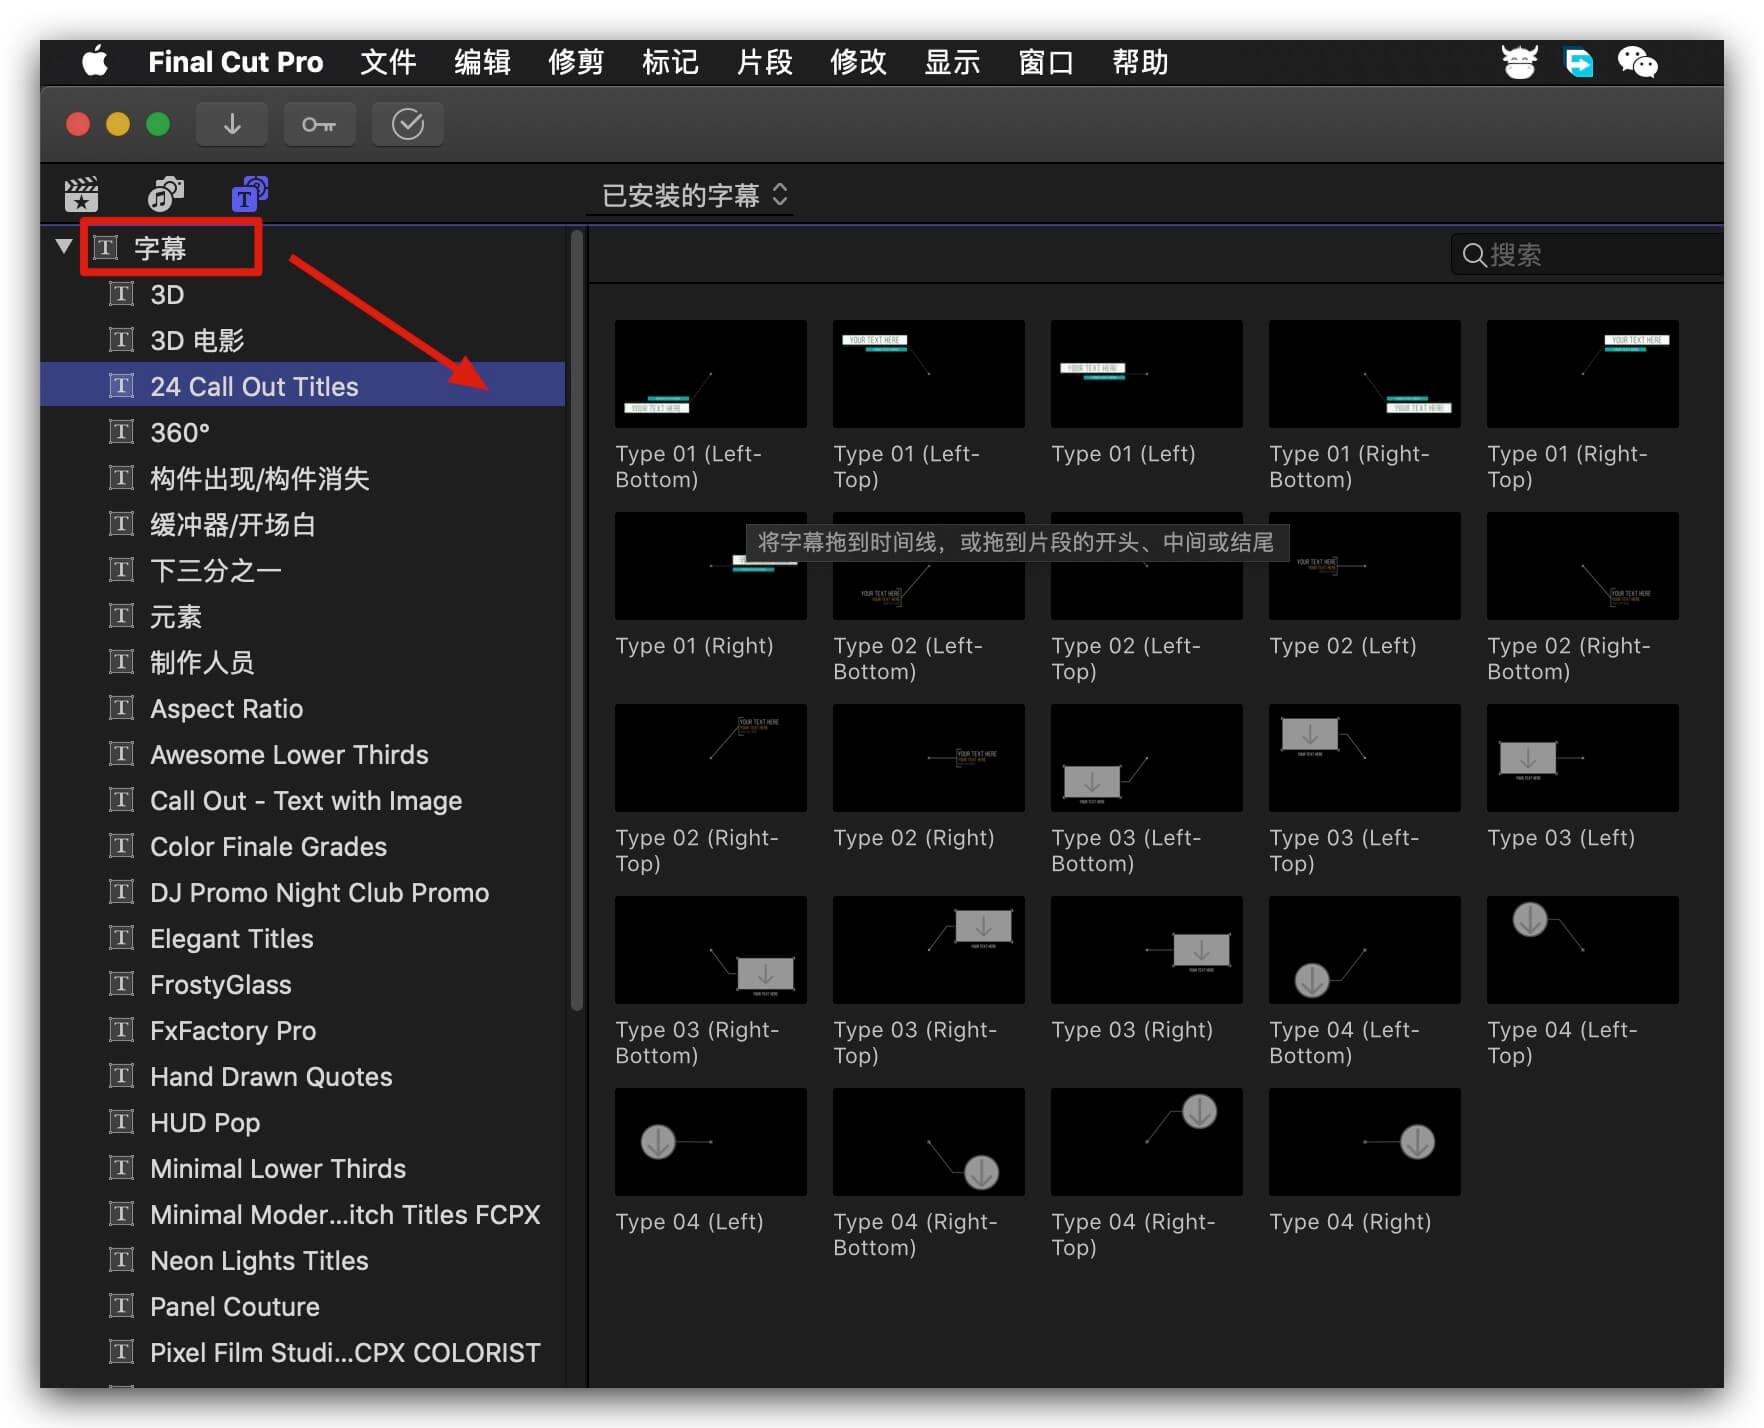 Fcpx插件 24组线条呼出标题文字注释细节放大动画模板 Call Out Titles